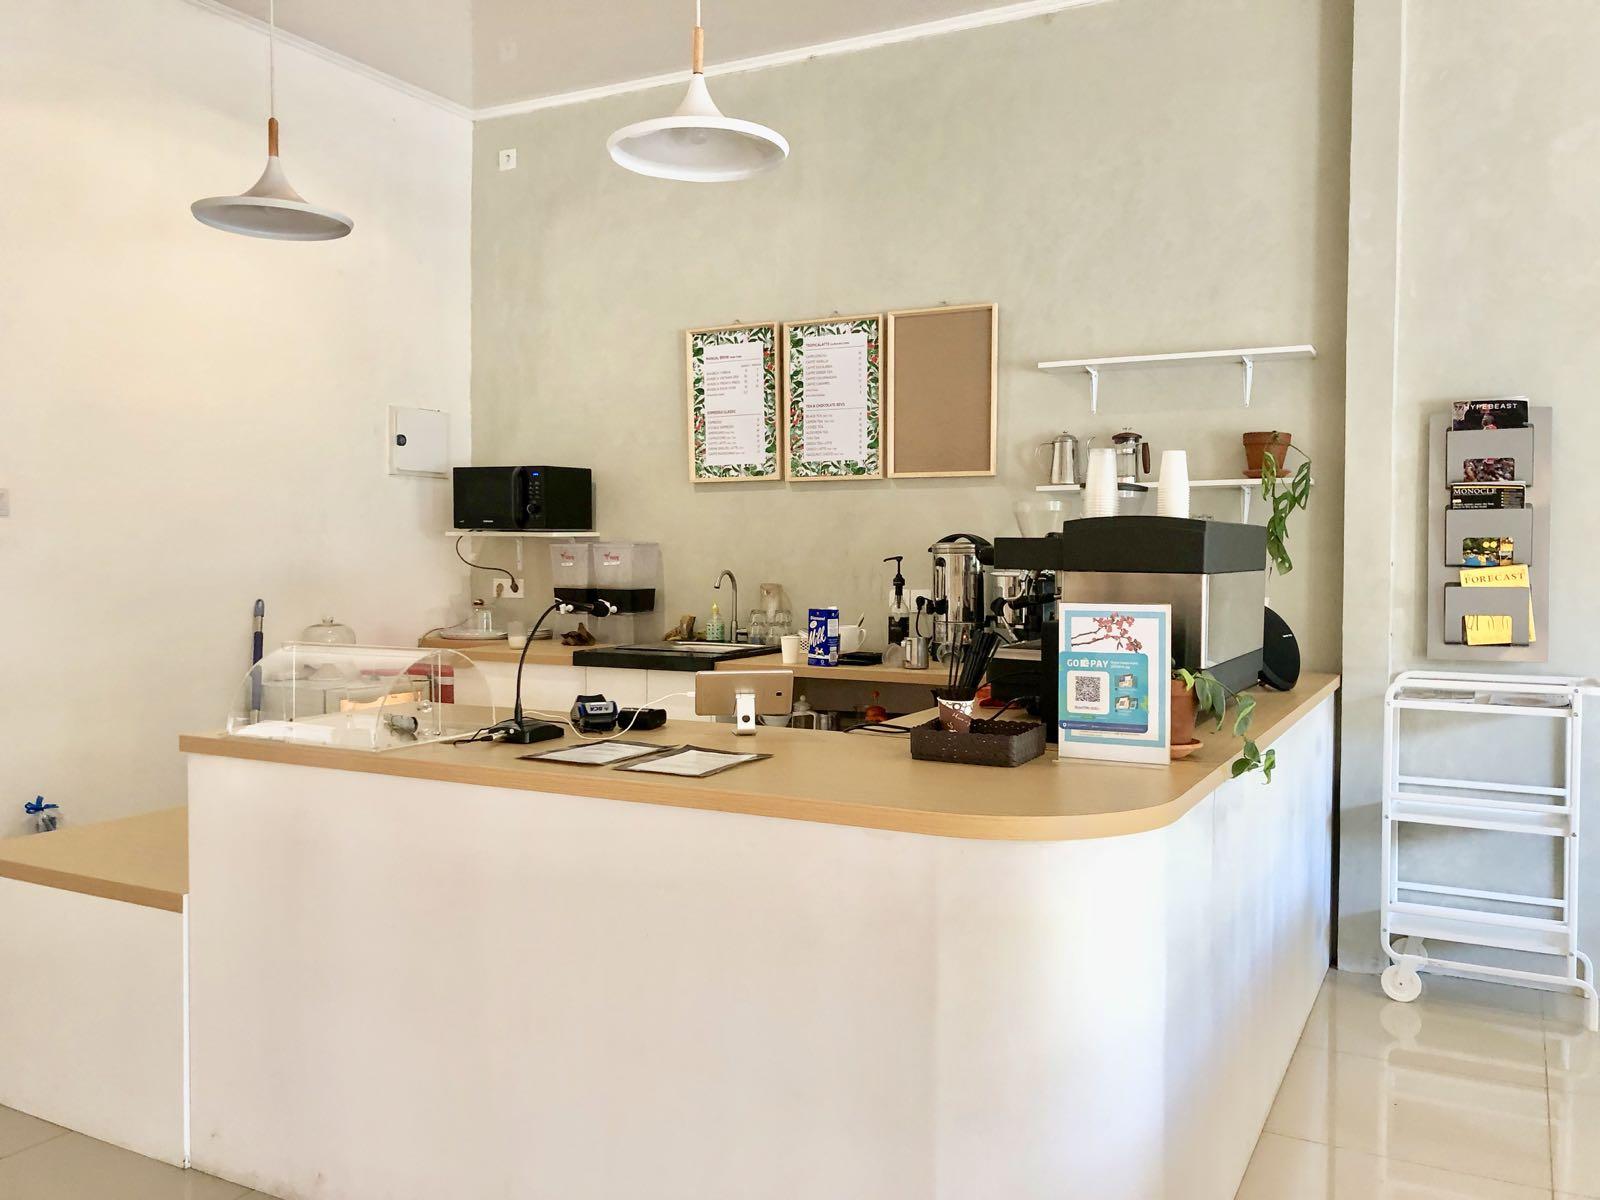 Terminal Coffee Bandung